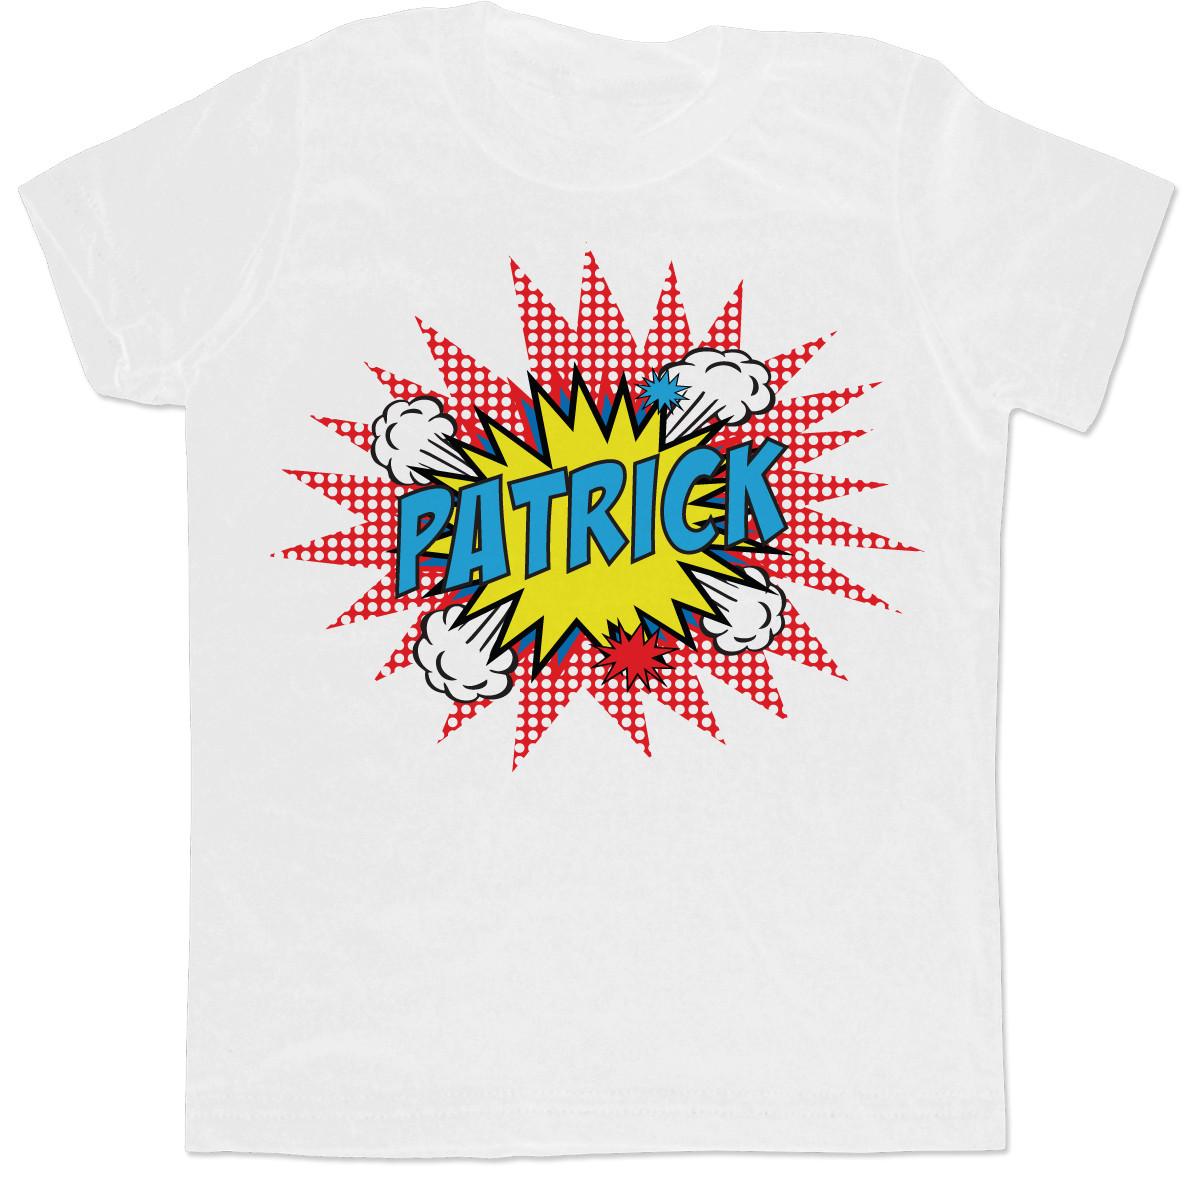 personalized pop art t shirt